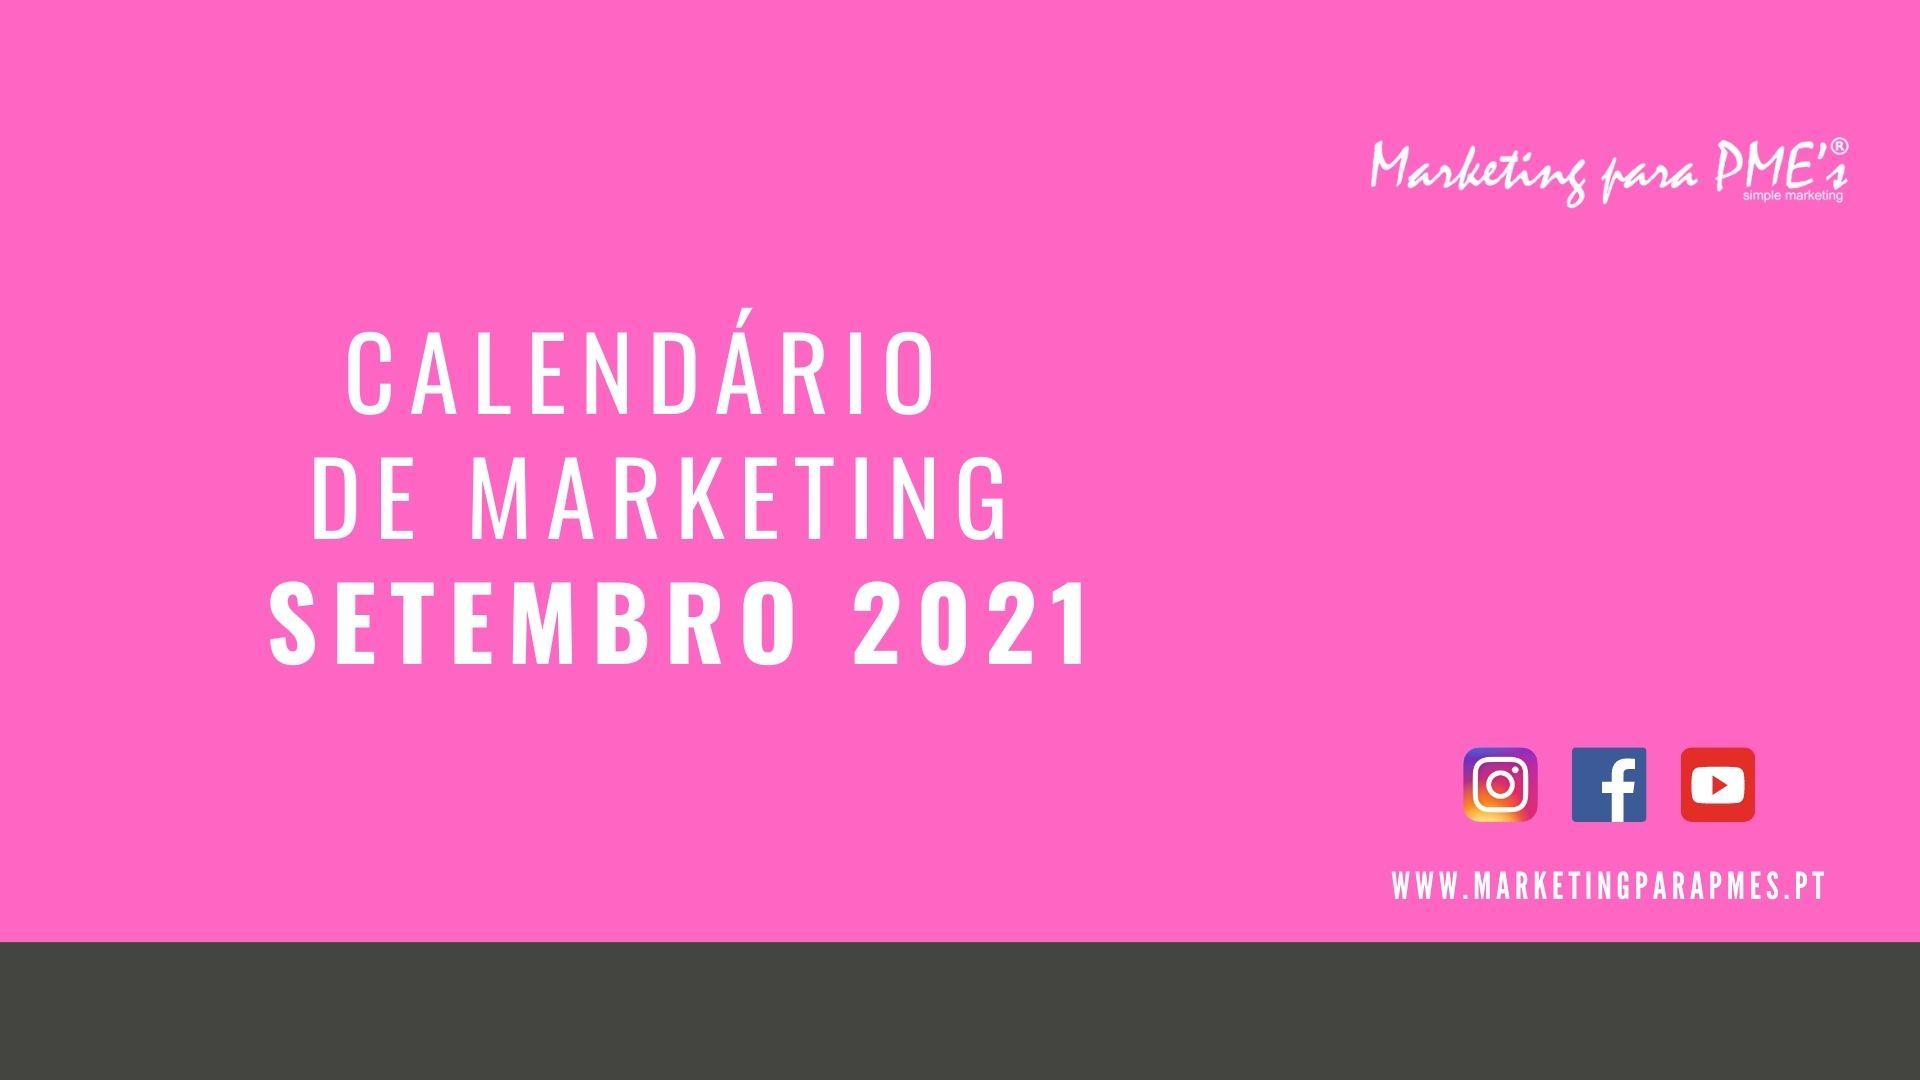 Calendario marketing